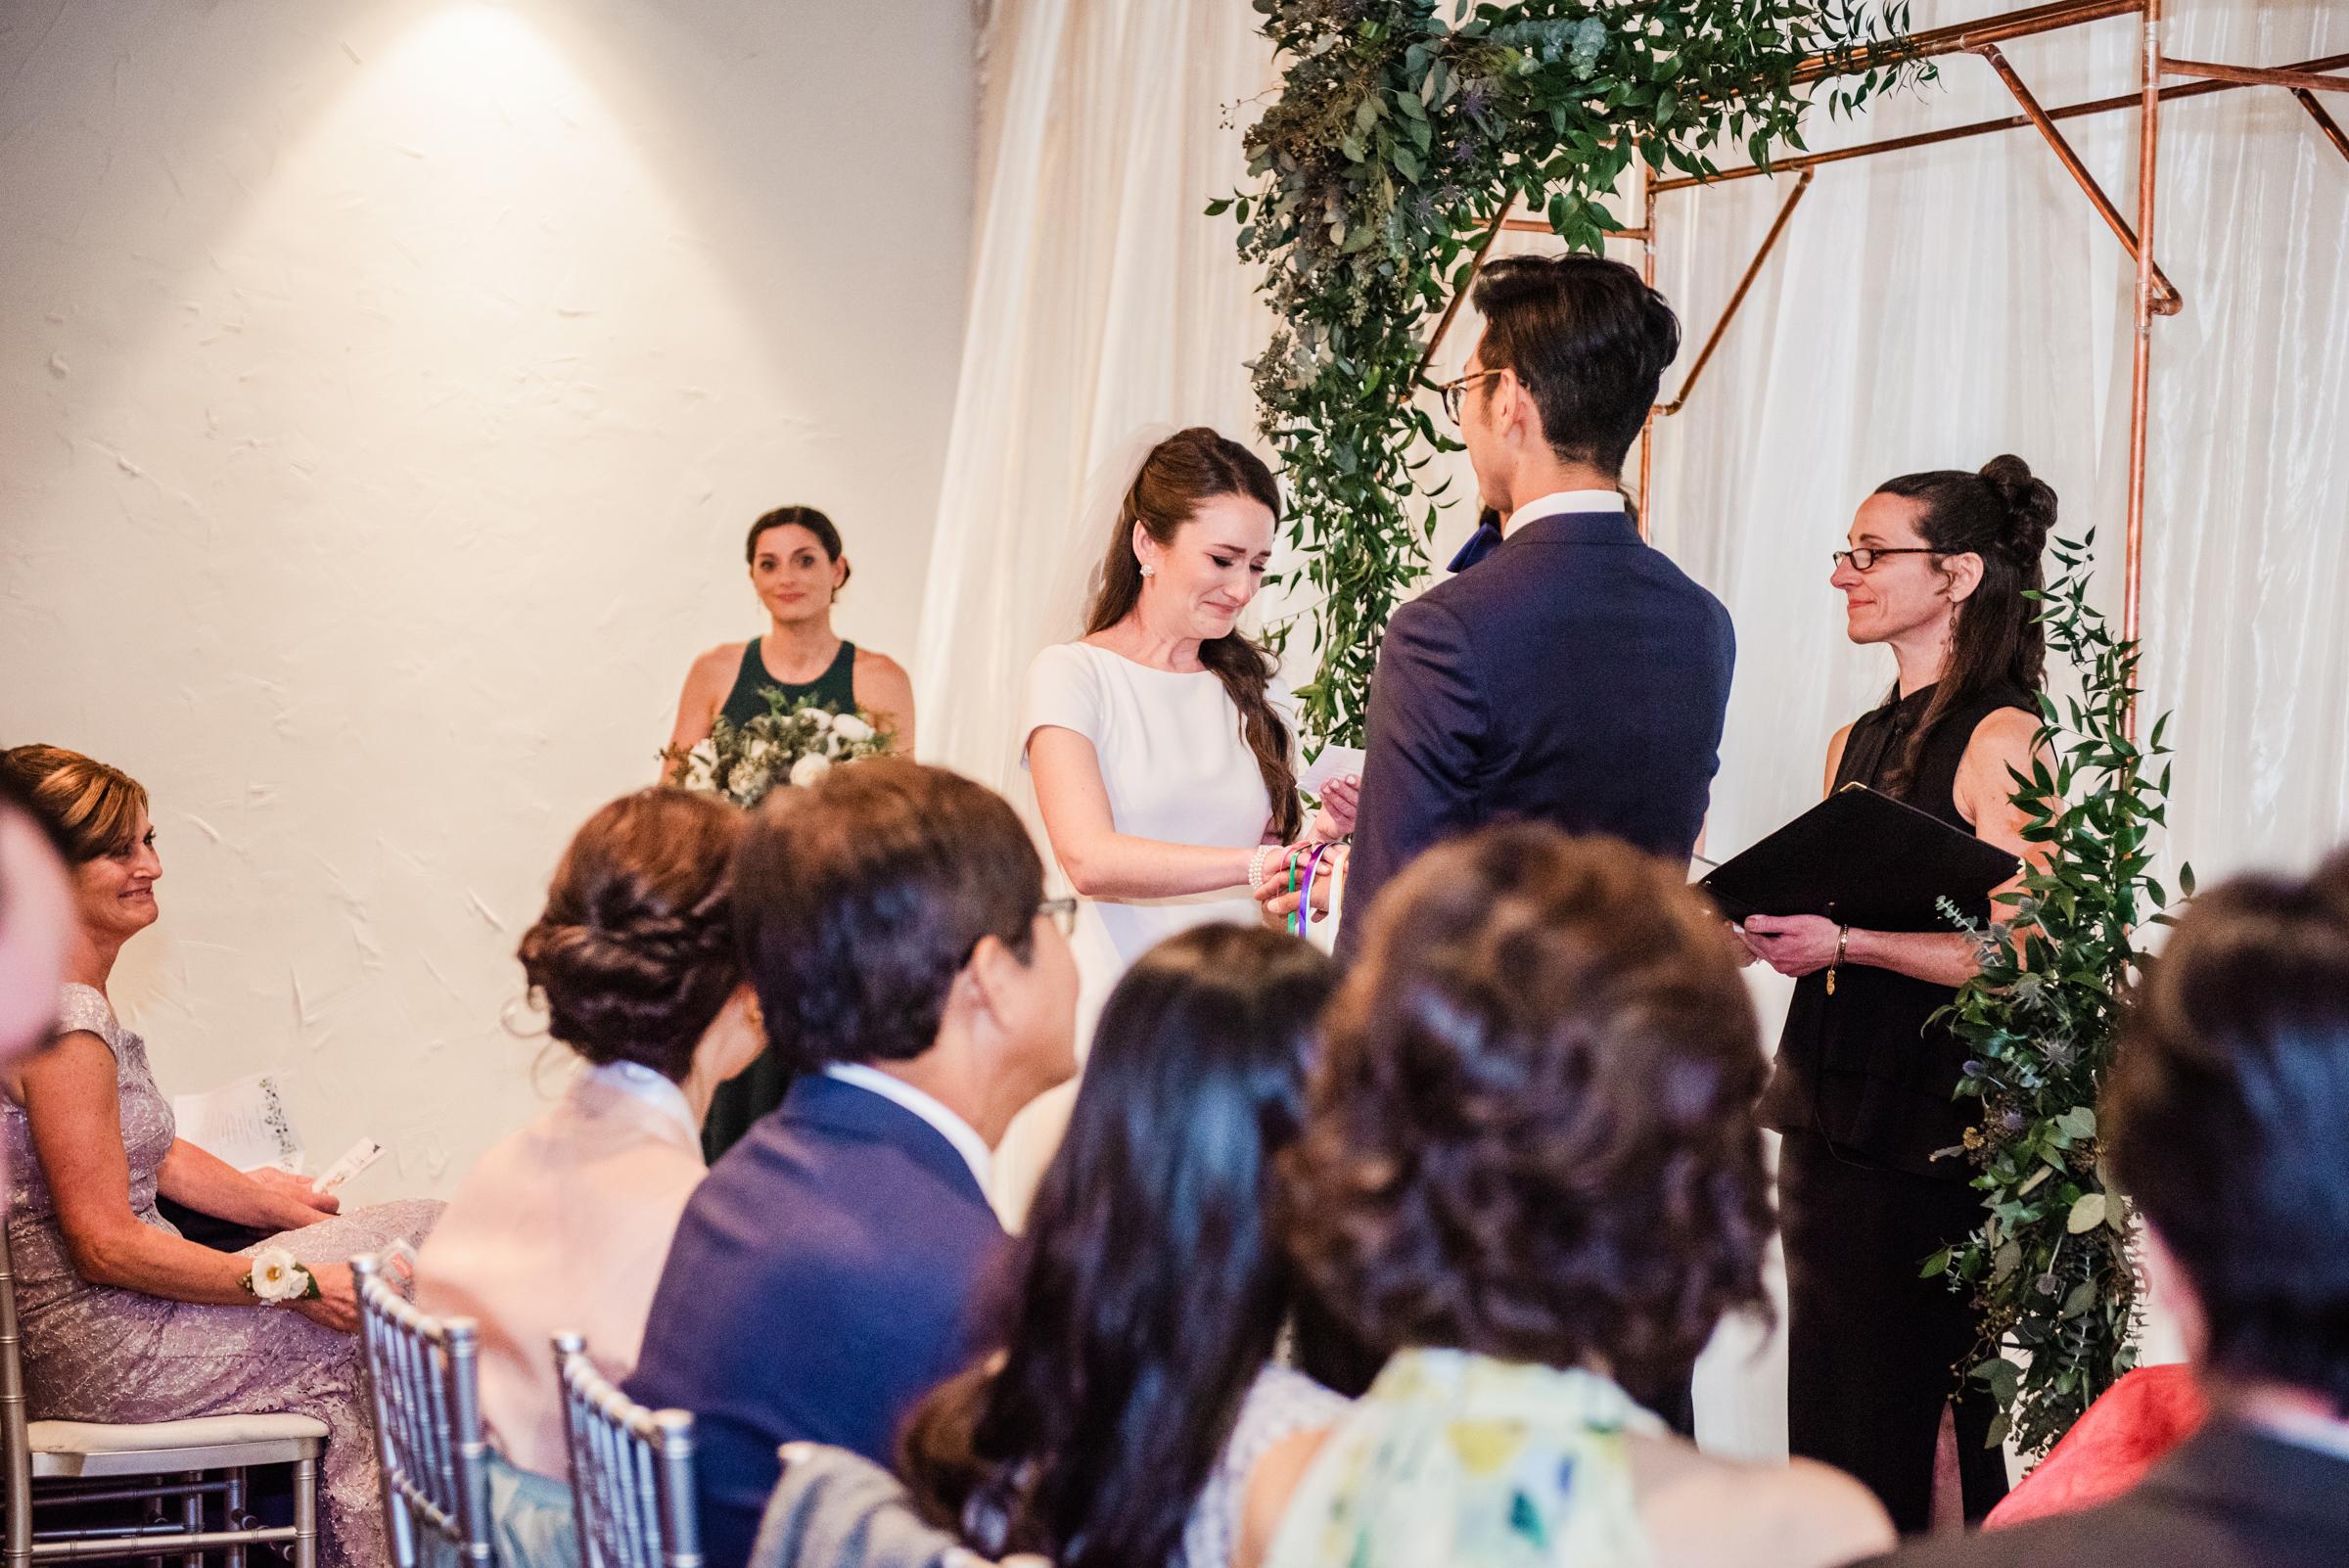 SKY_Armory_Syracuse_Wedding_JILL_STUDIO_Rochester_NY_Photographer_DSC_5898.jpg